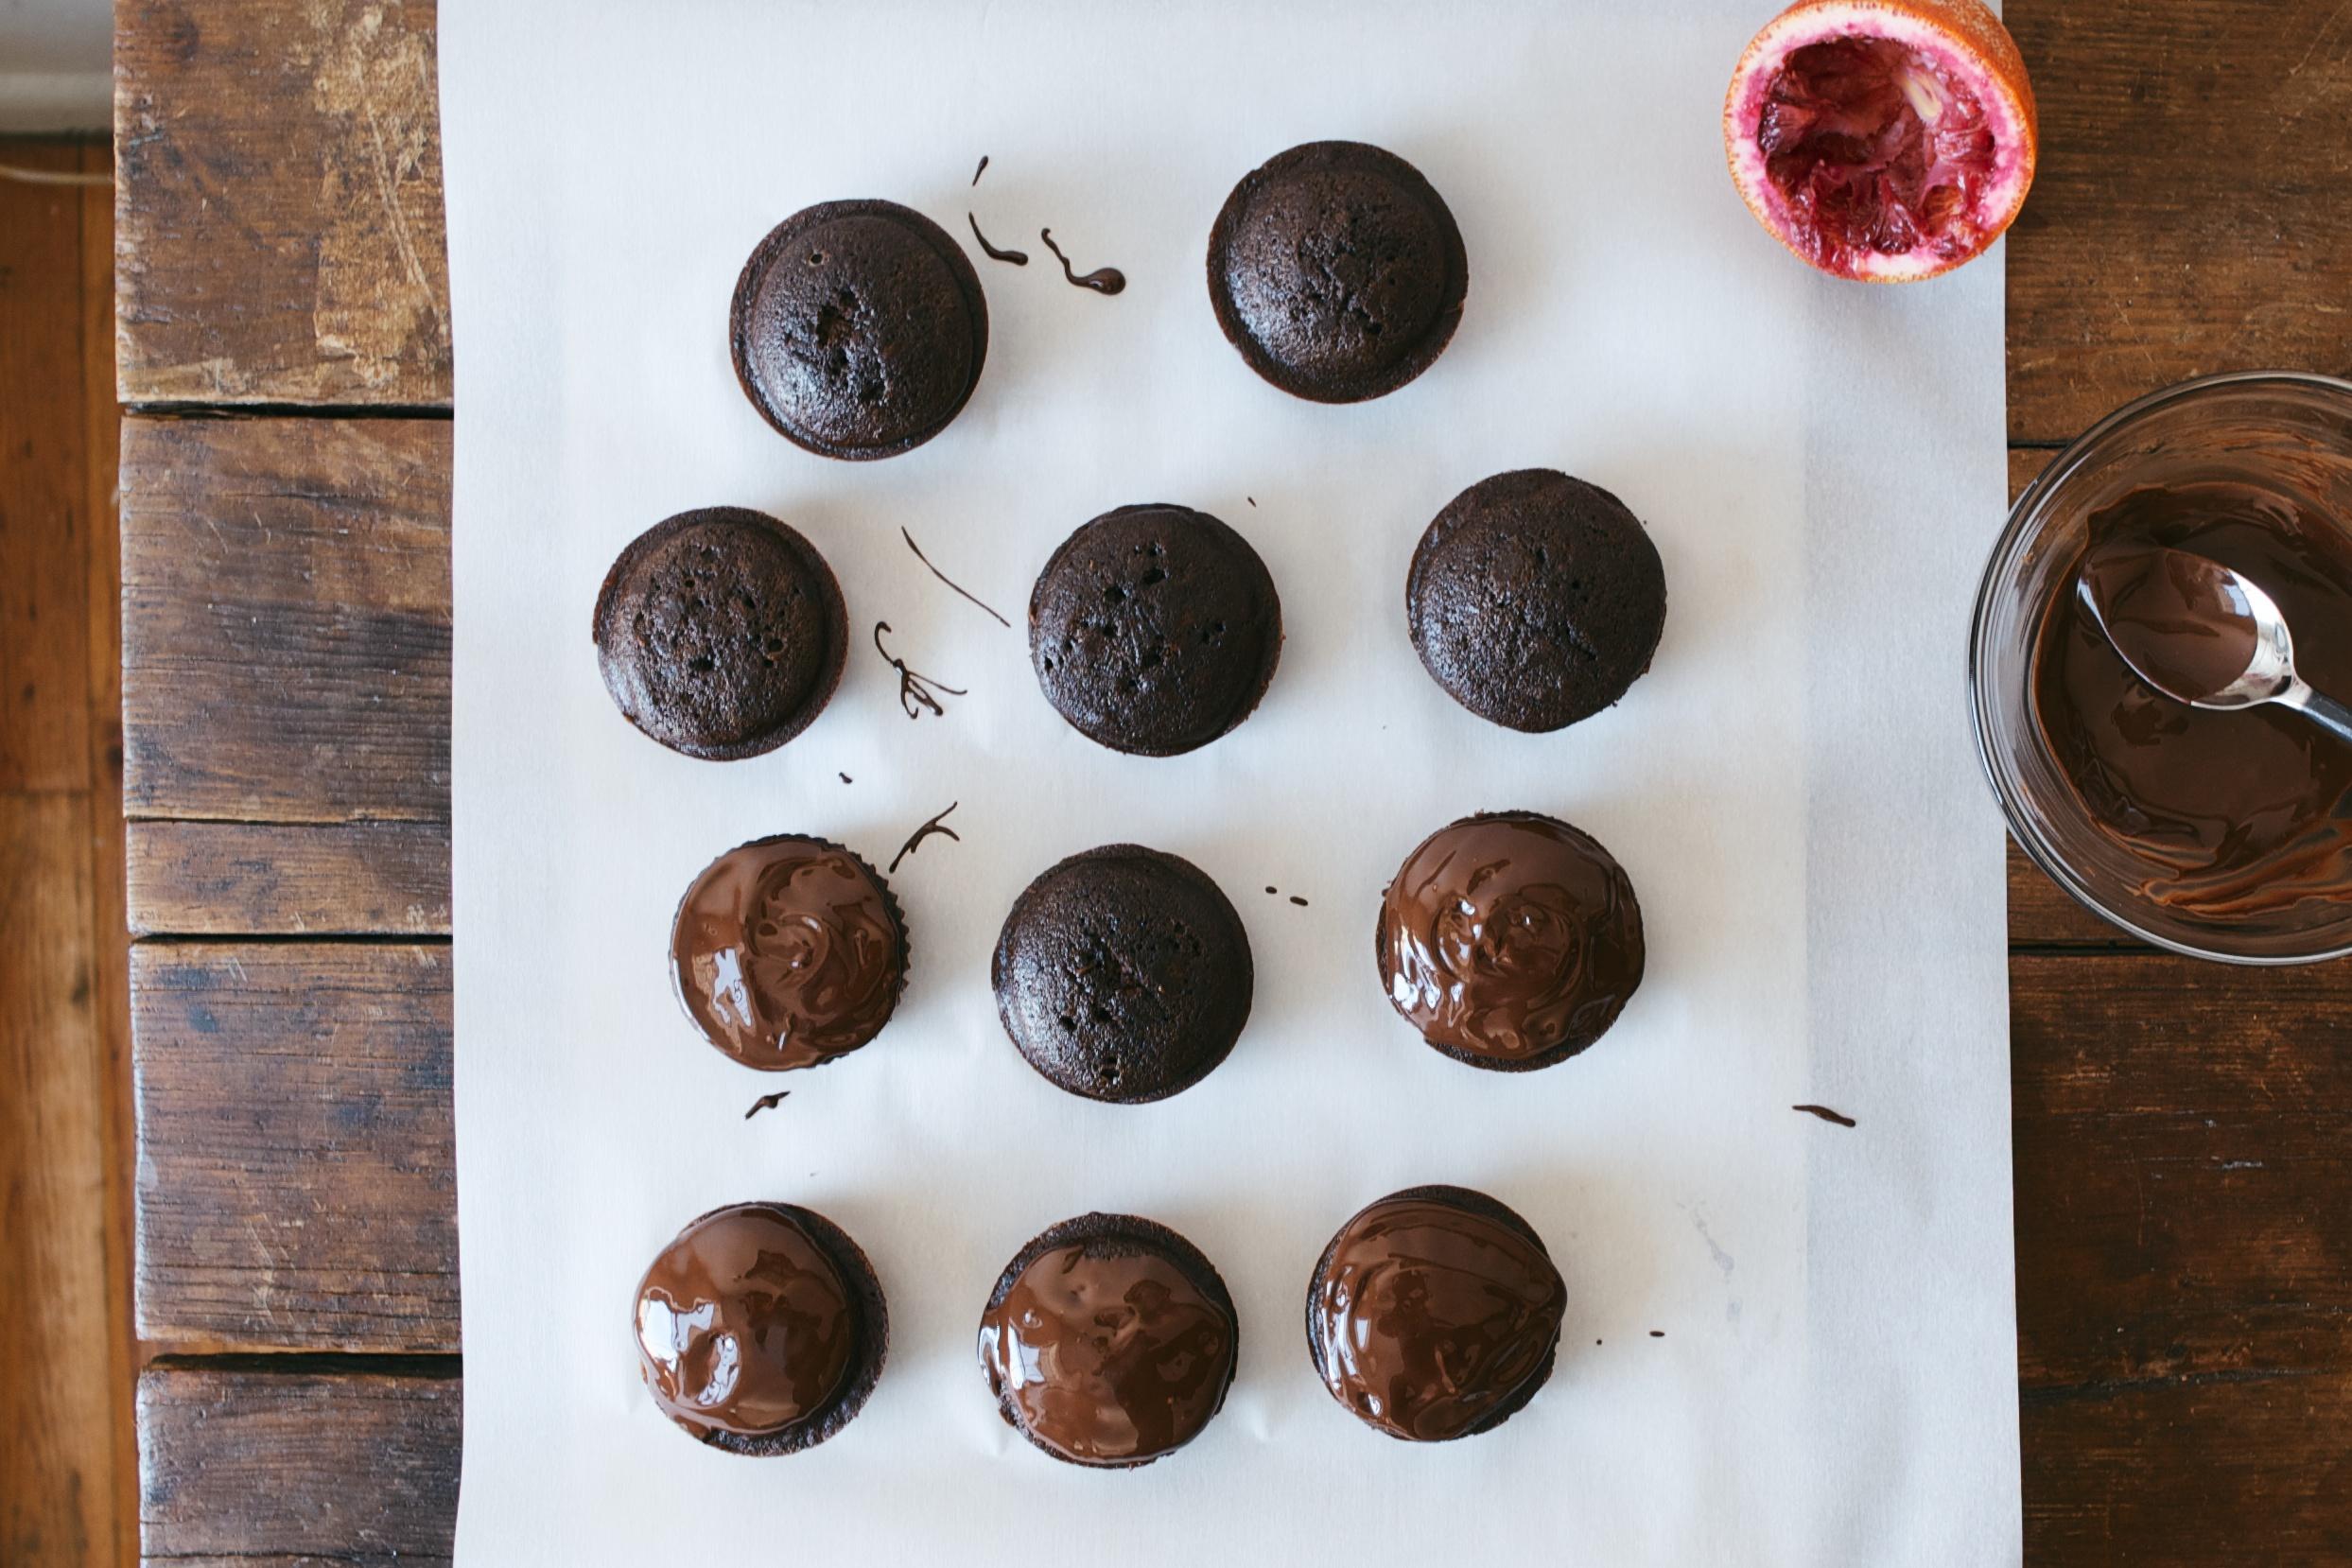 vday cupcakes